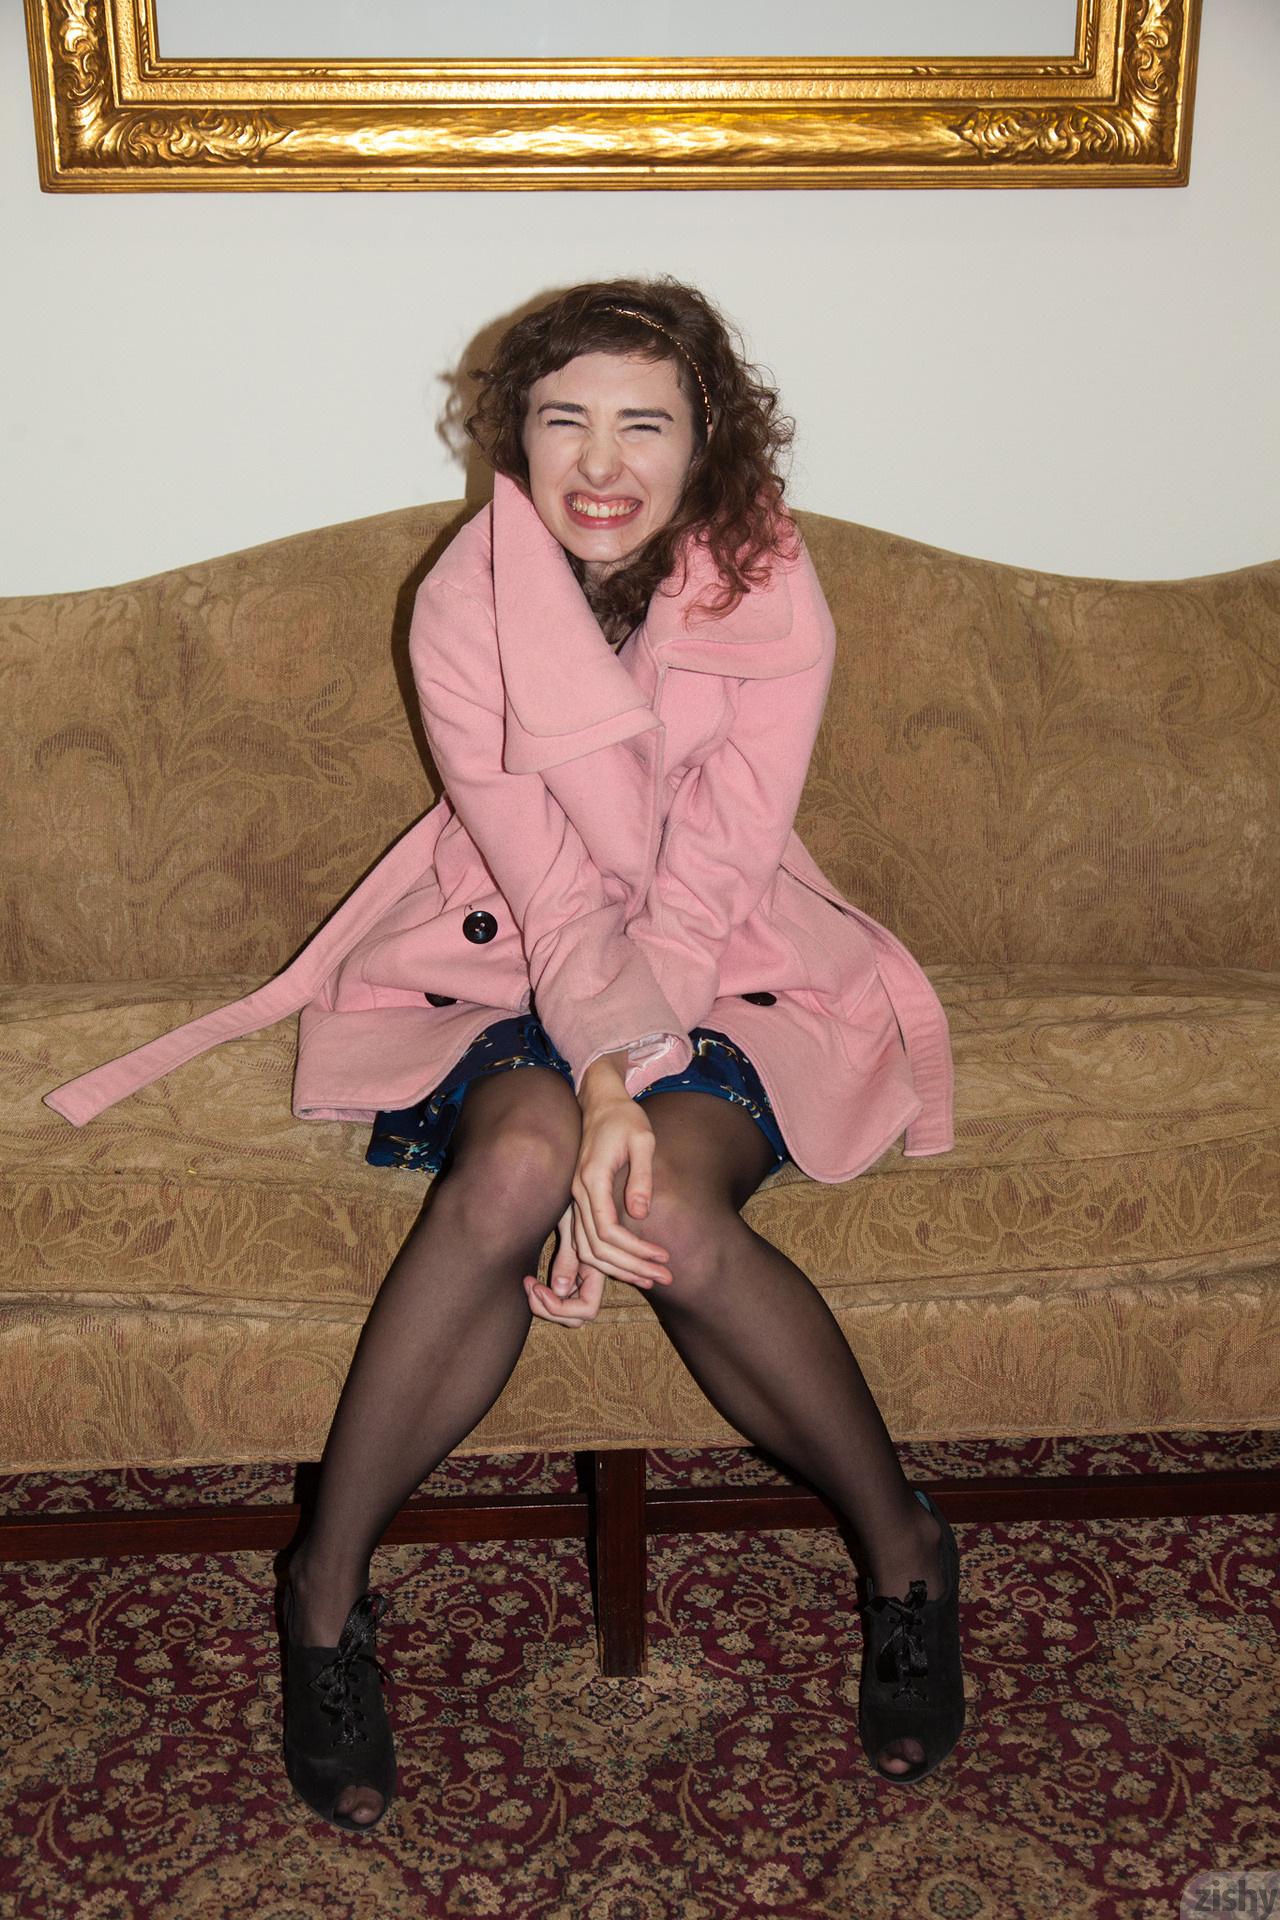 Yekaterina golubeva naked